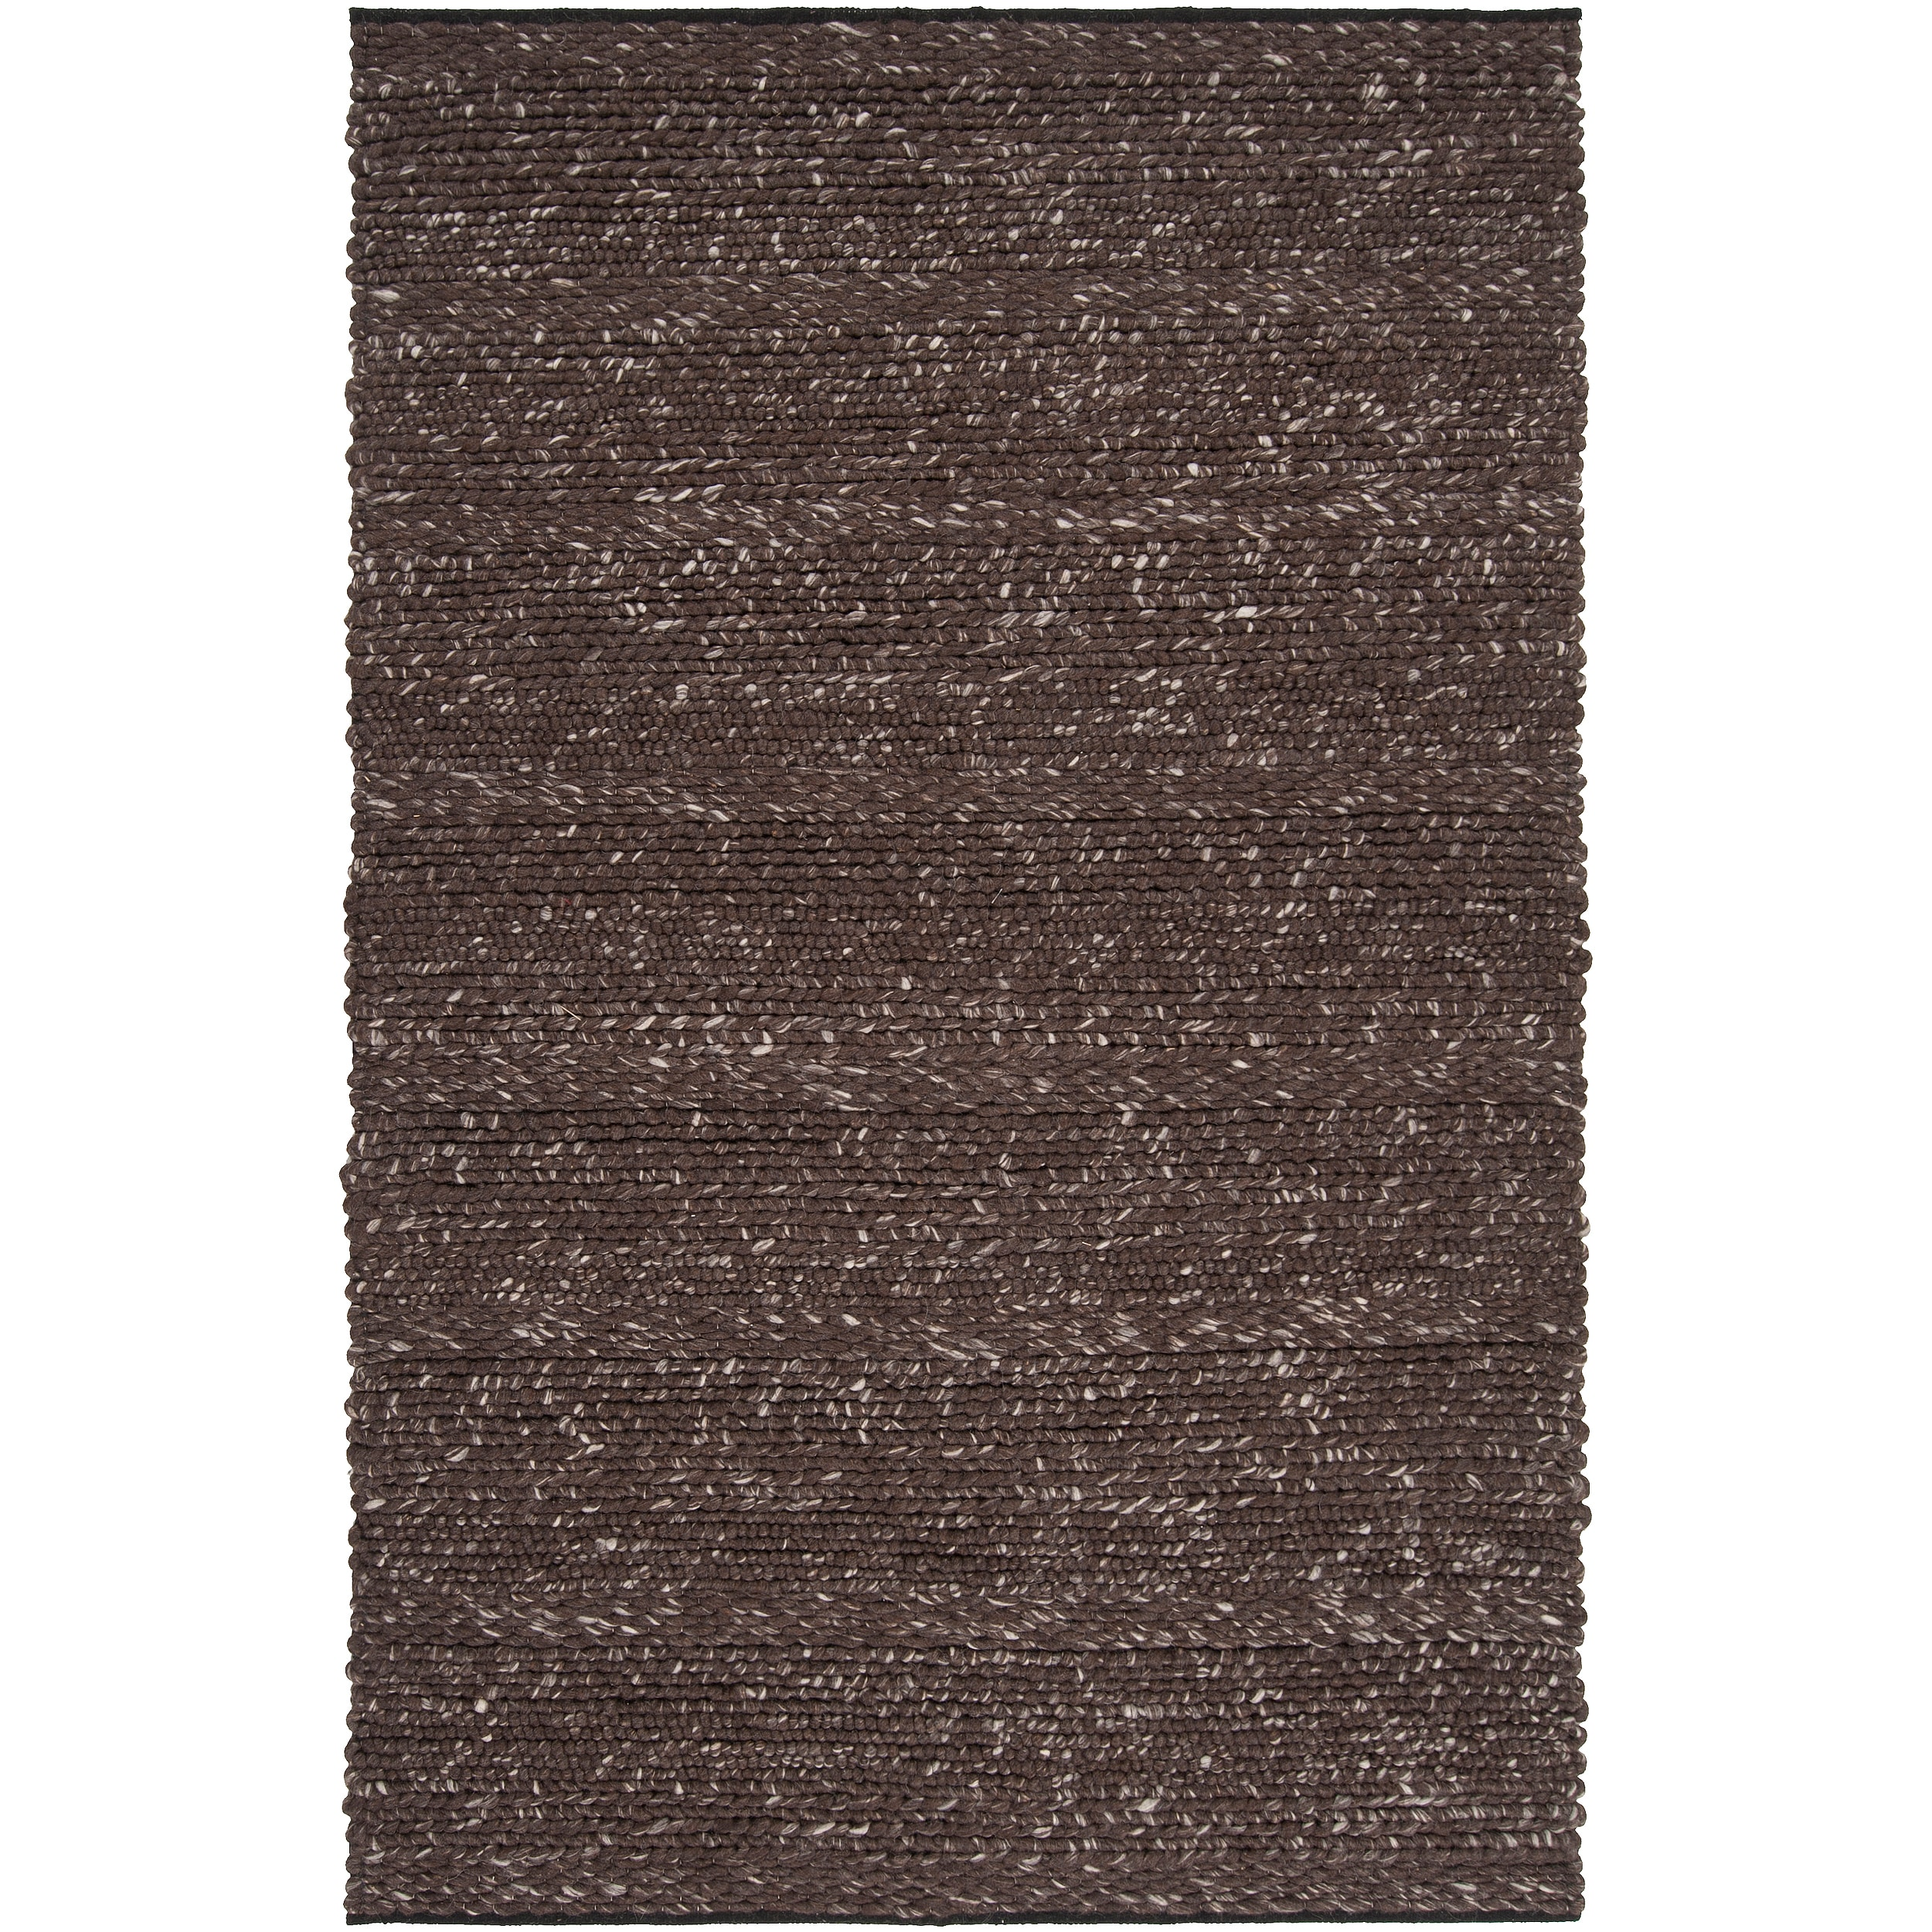 Hand-woven Casual Solid Brown Angoon Wool Area Rug - 8' x 10'